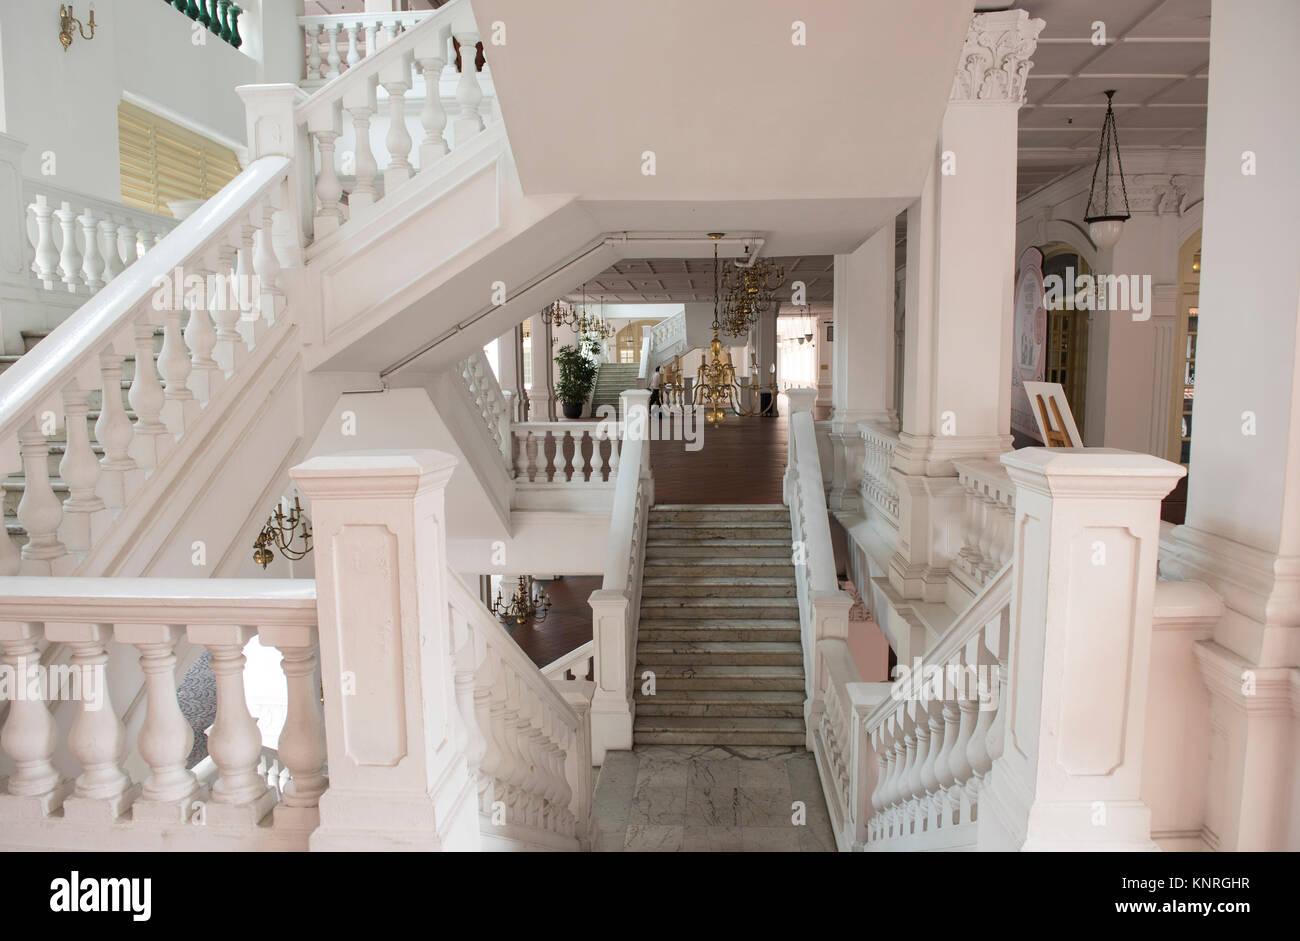 raffles hotel, singapore, stairway - Stock Image